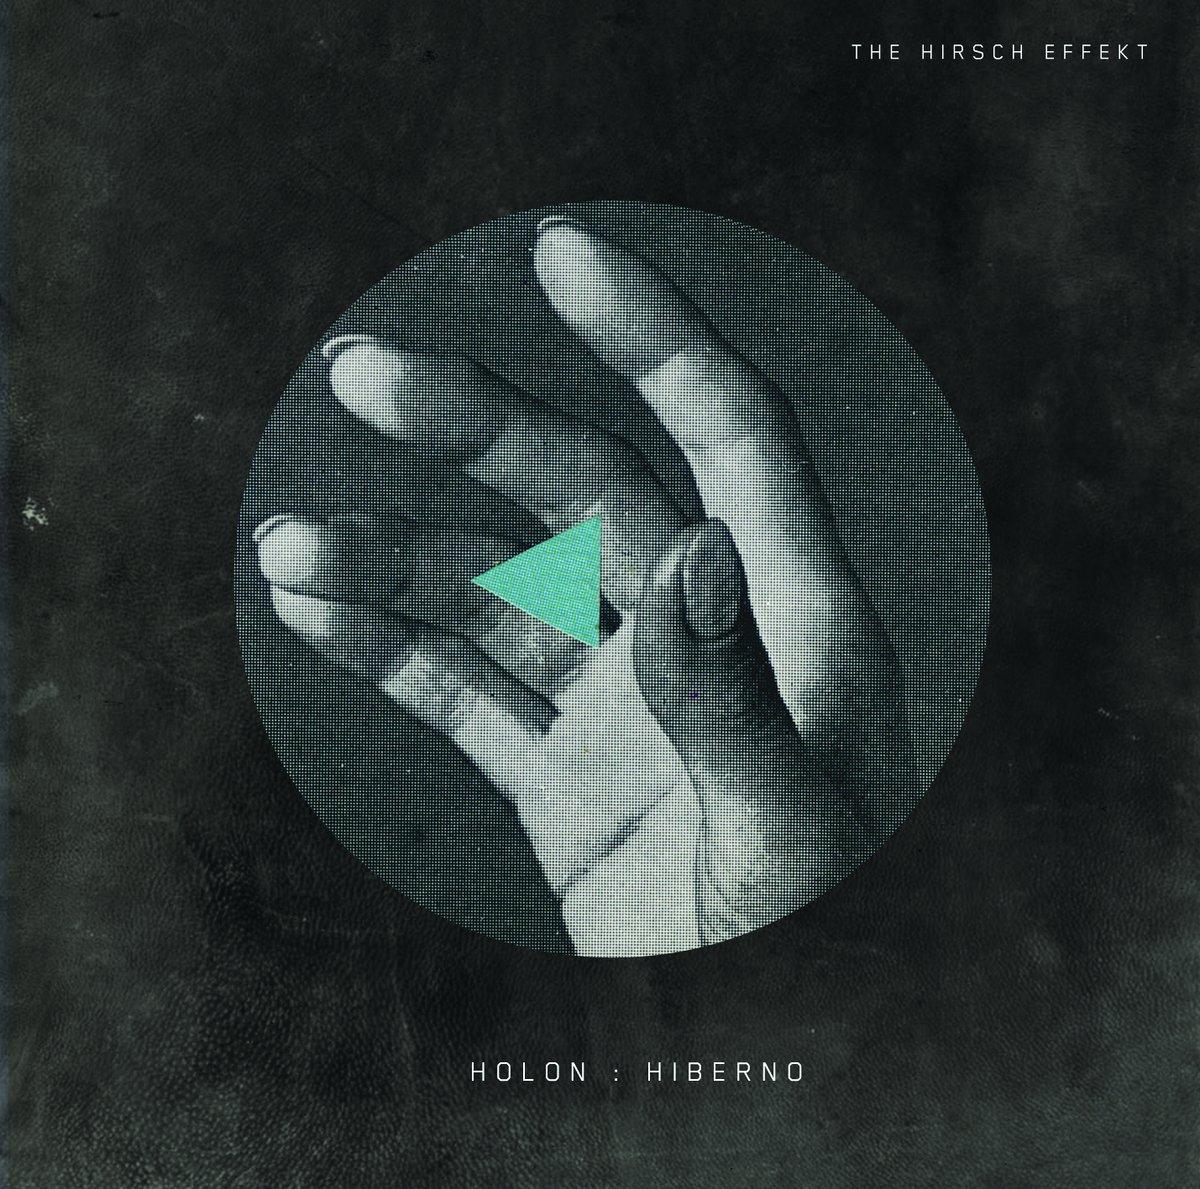 HOLON : HIBERNO CD